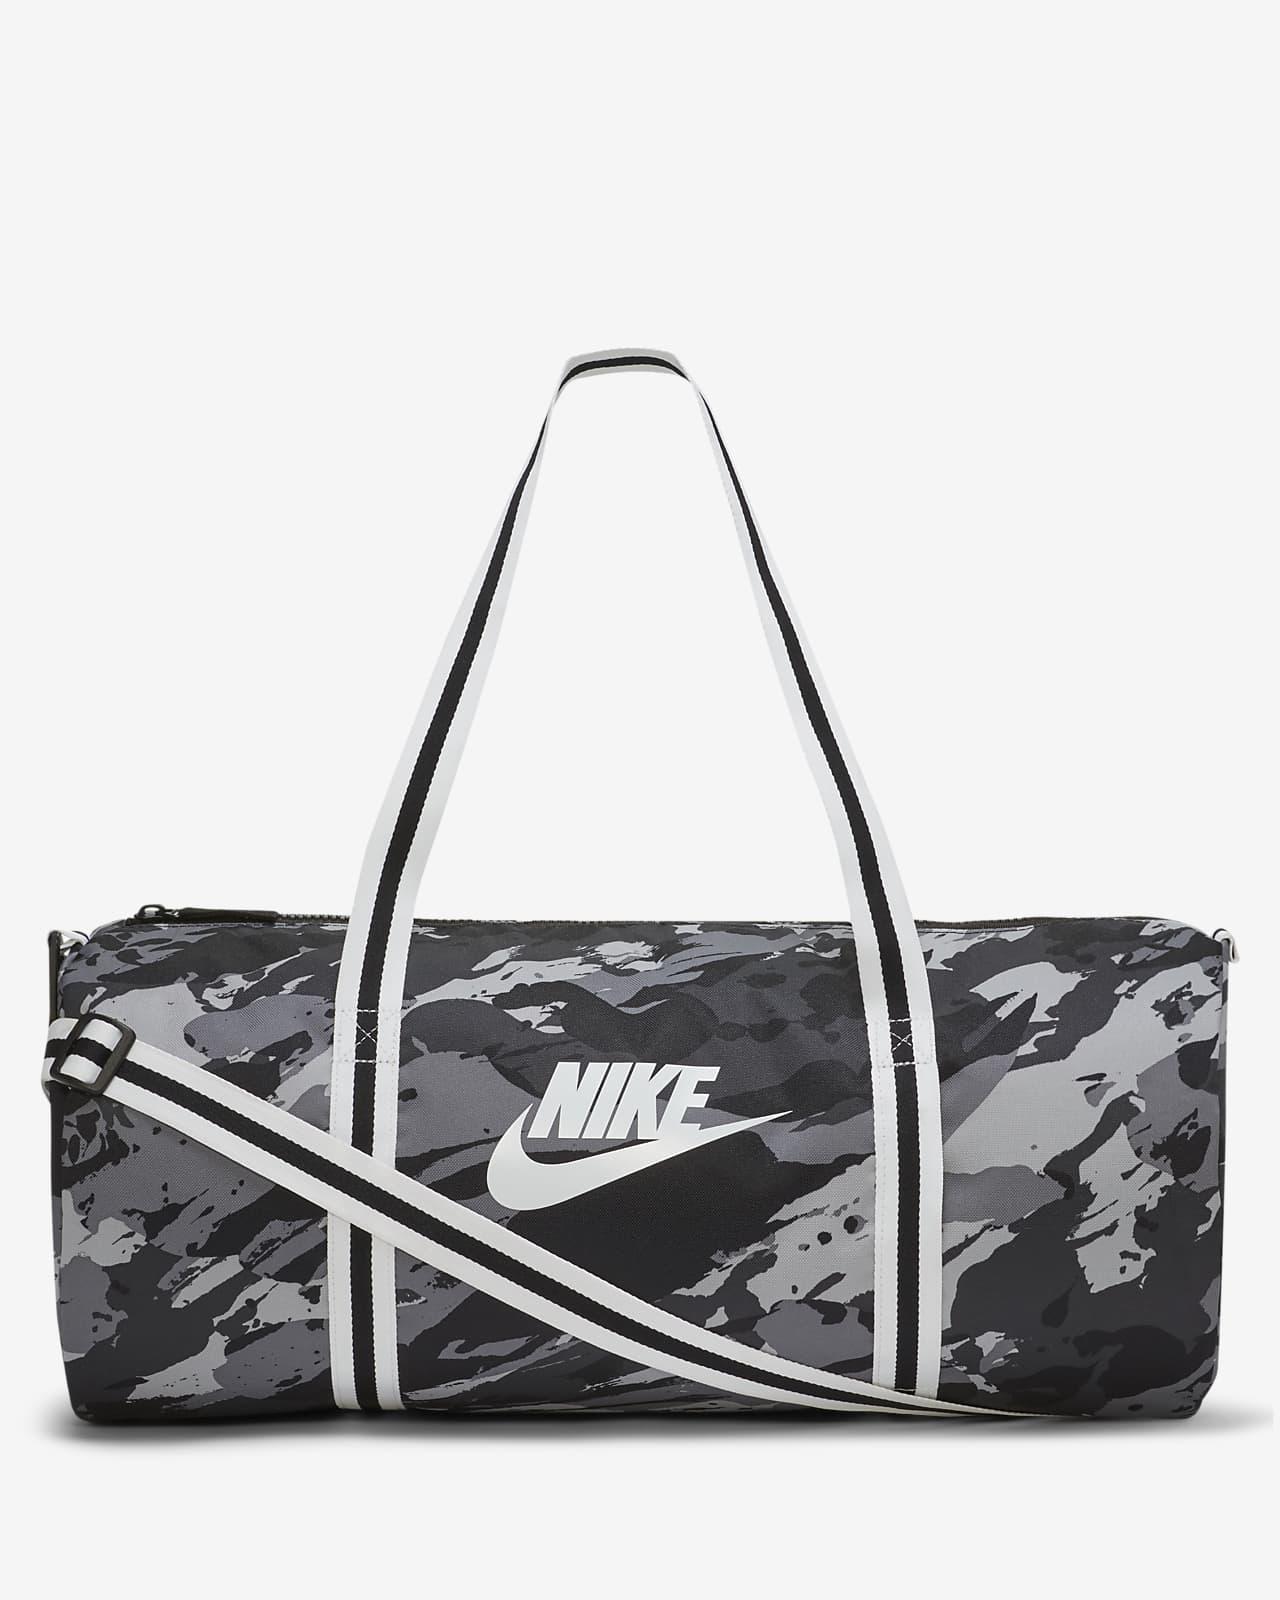 Nike Heritage Printed Duffle Bag